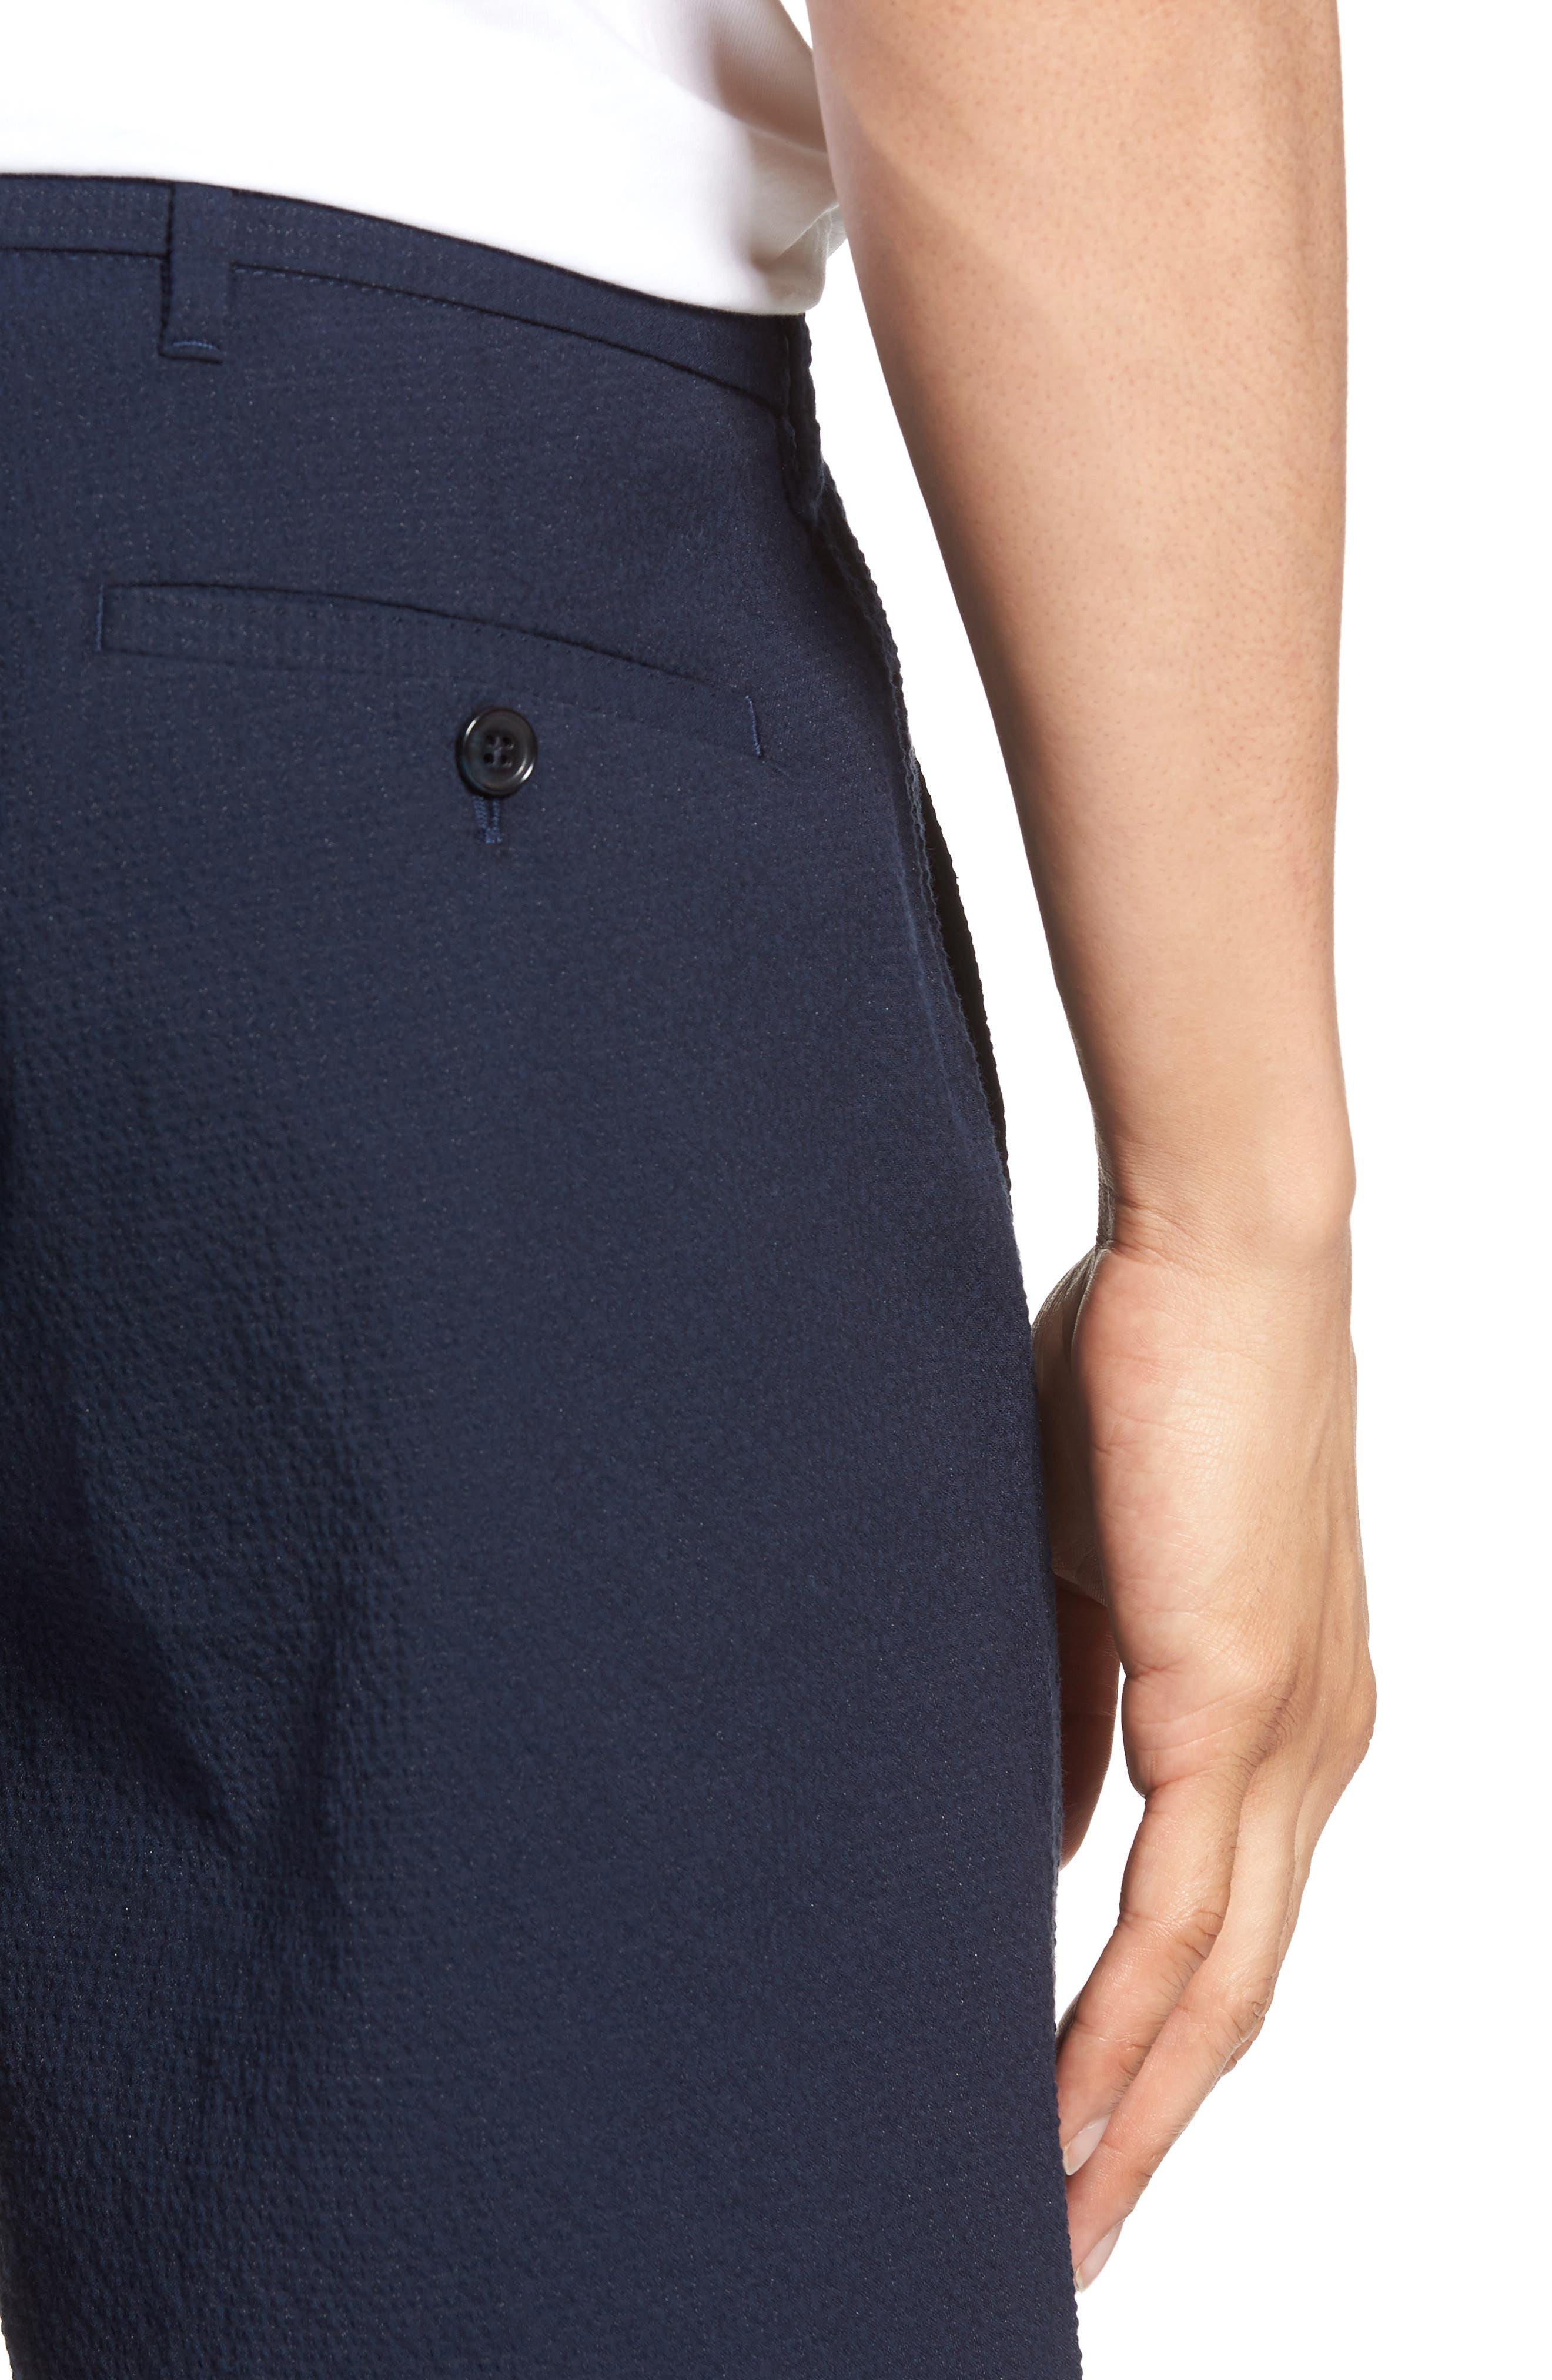 Costa Cotton Blend Shorts,                             Alternate thumbnail 4, color,                             410